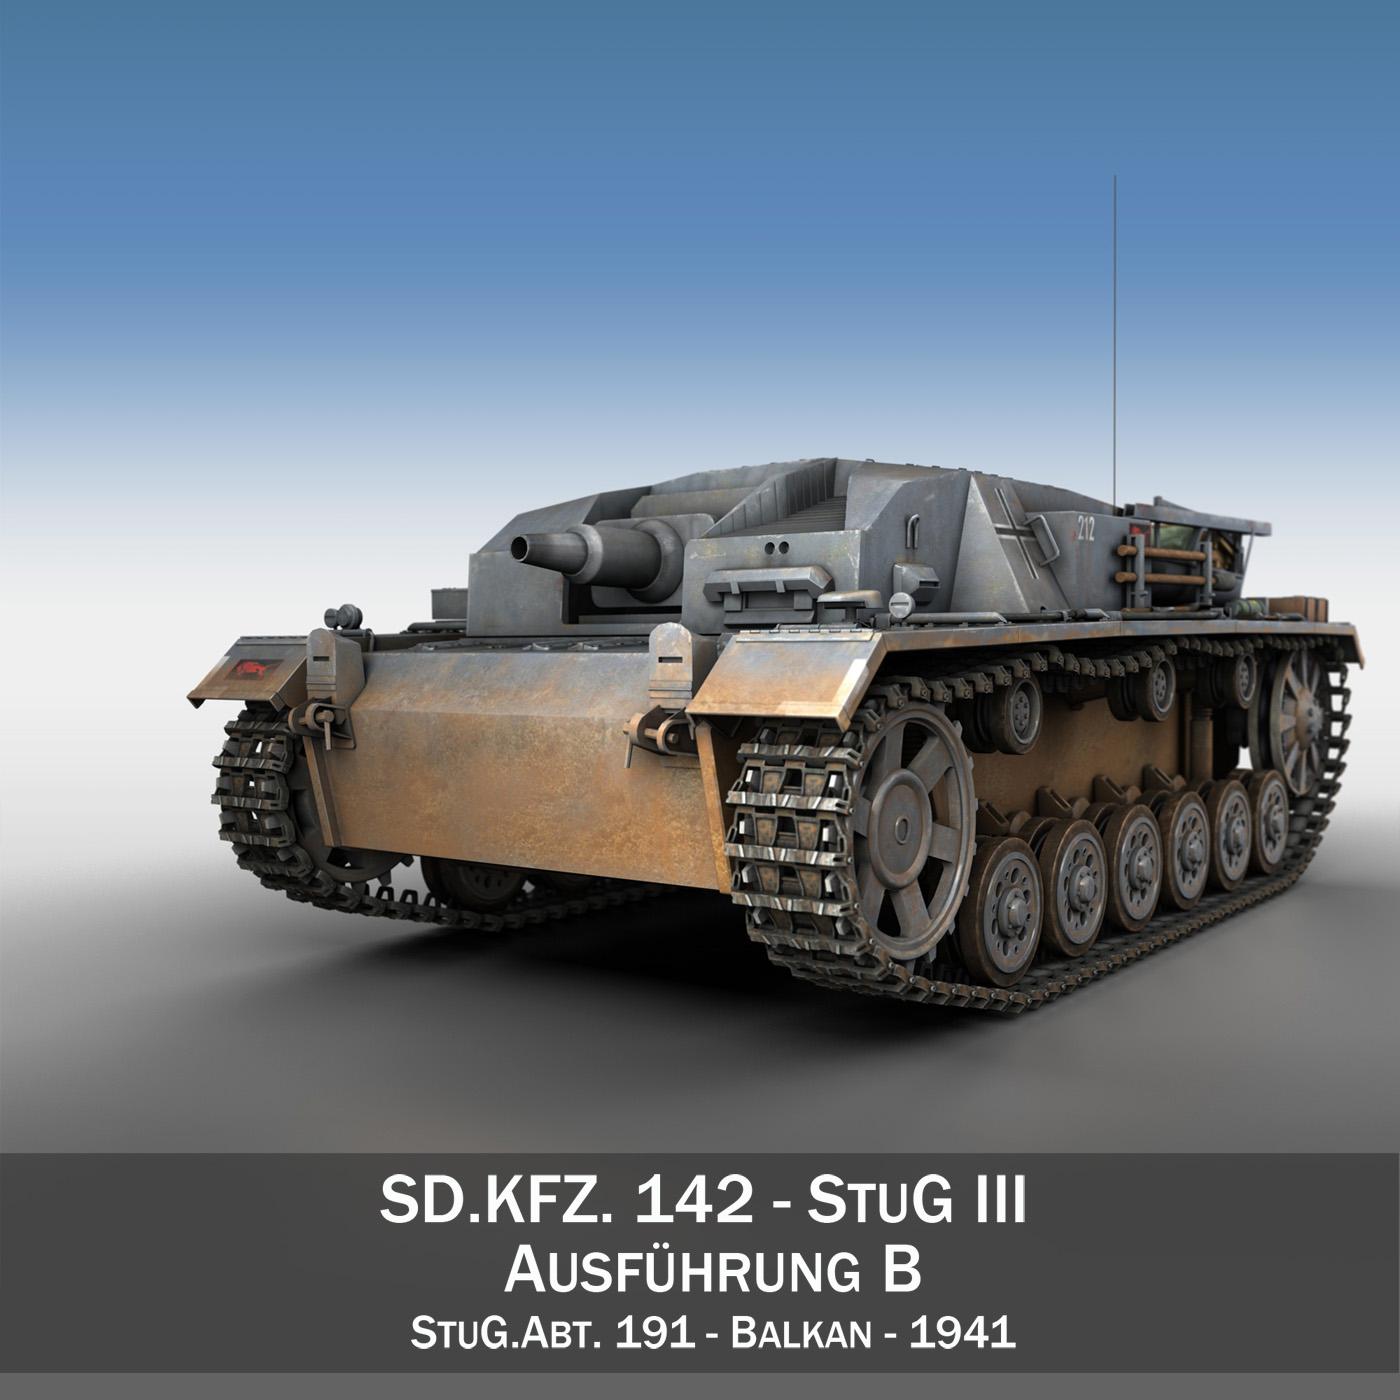 StuG III - Ausf.B - StuG Abt 191 3d model 3ds fbx c4d lwo lws lw obj 282644